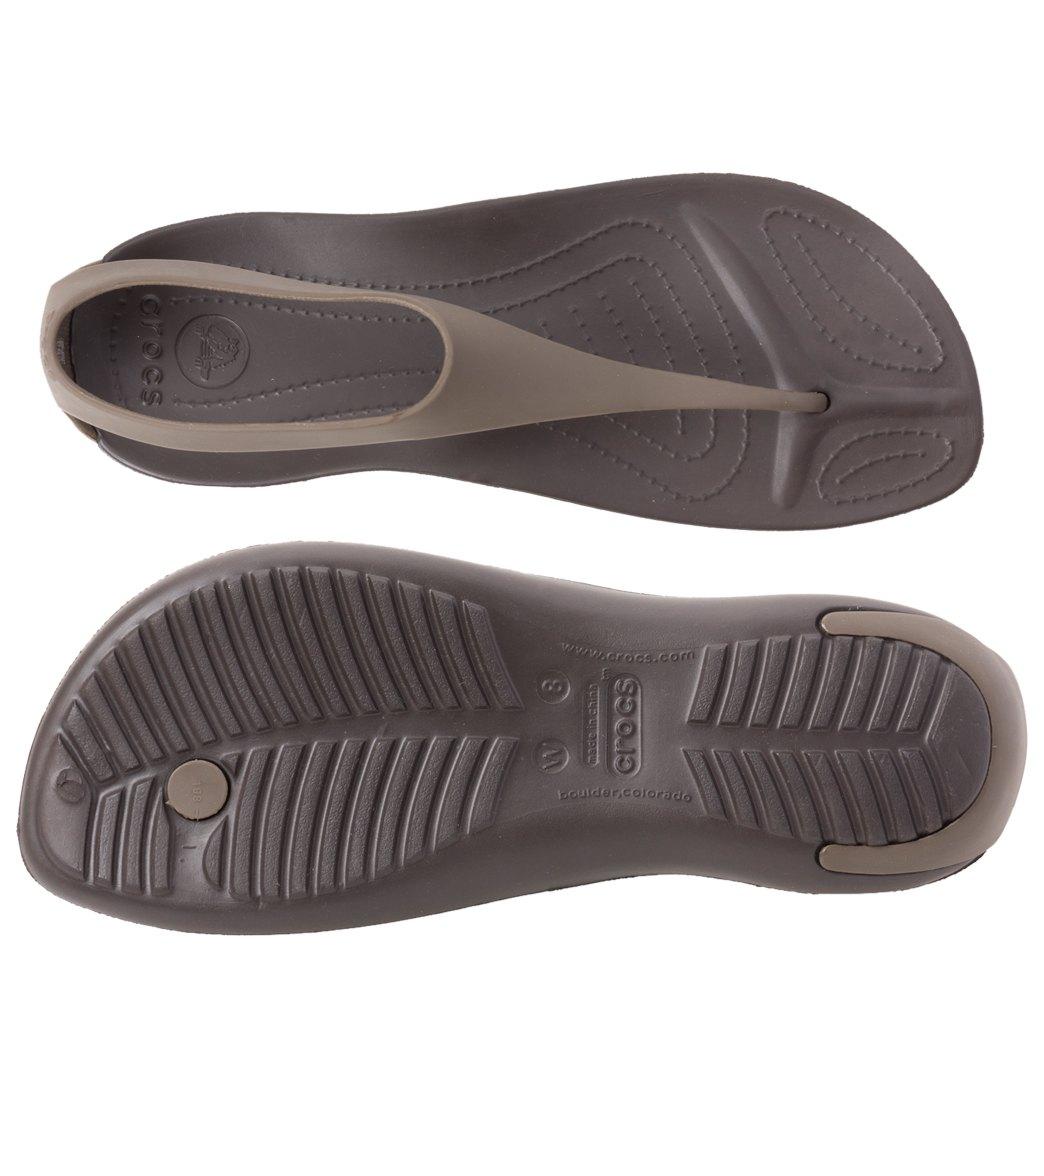 842e6b0f78b9e3 Crocs Women s Sexi Flip Sandal at SwimOutlet.com